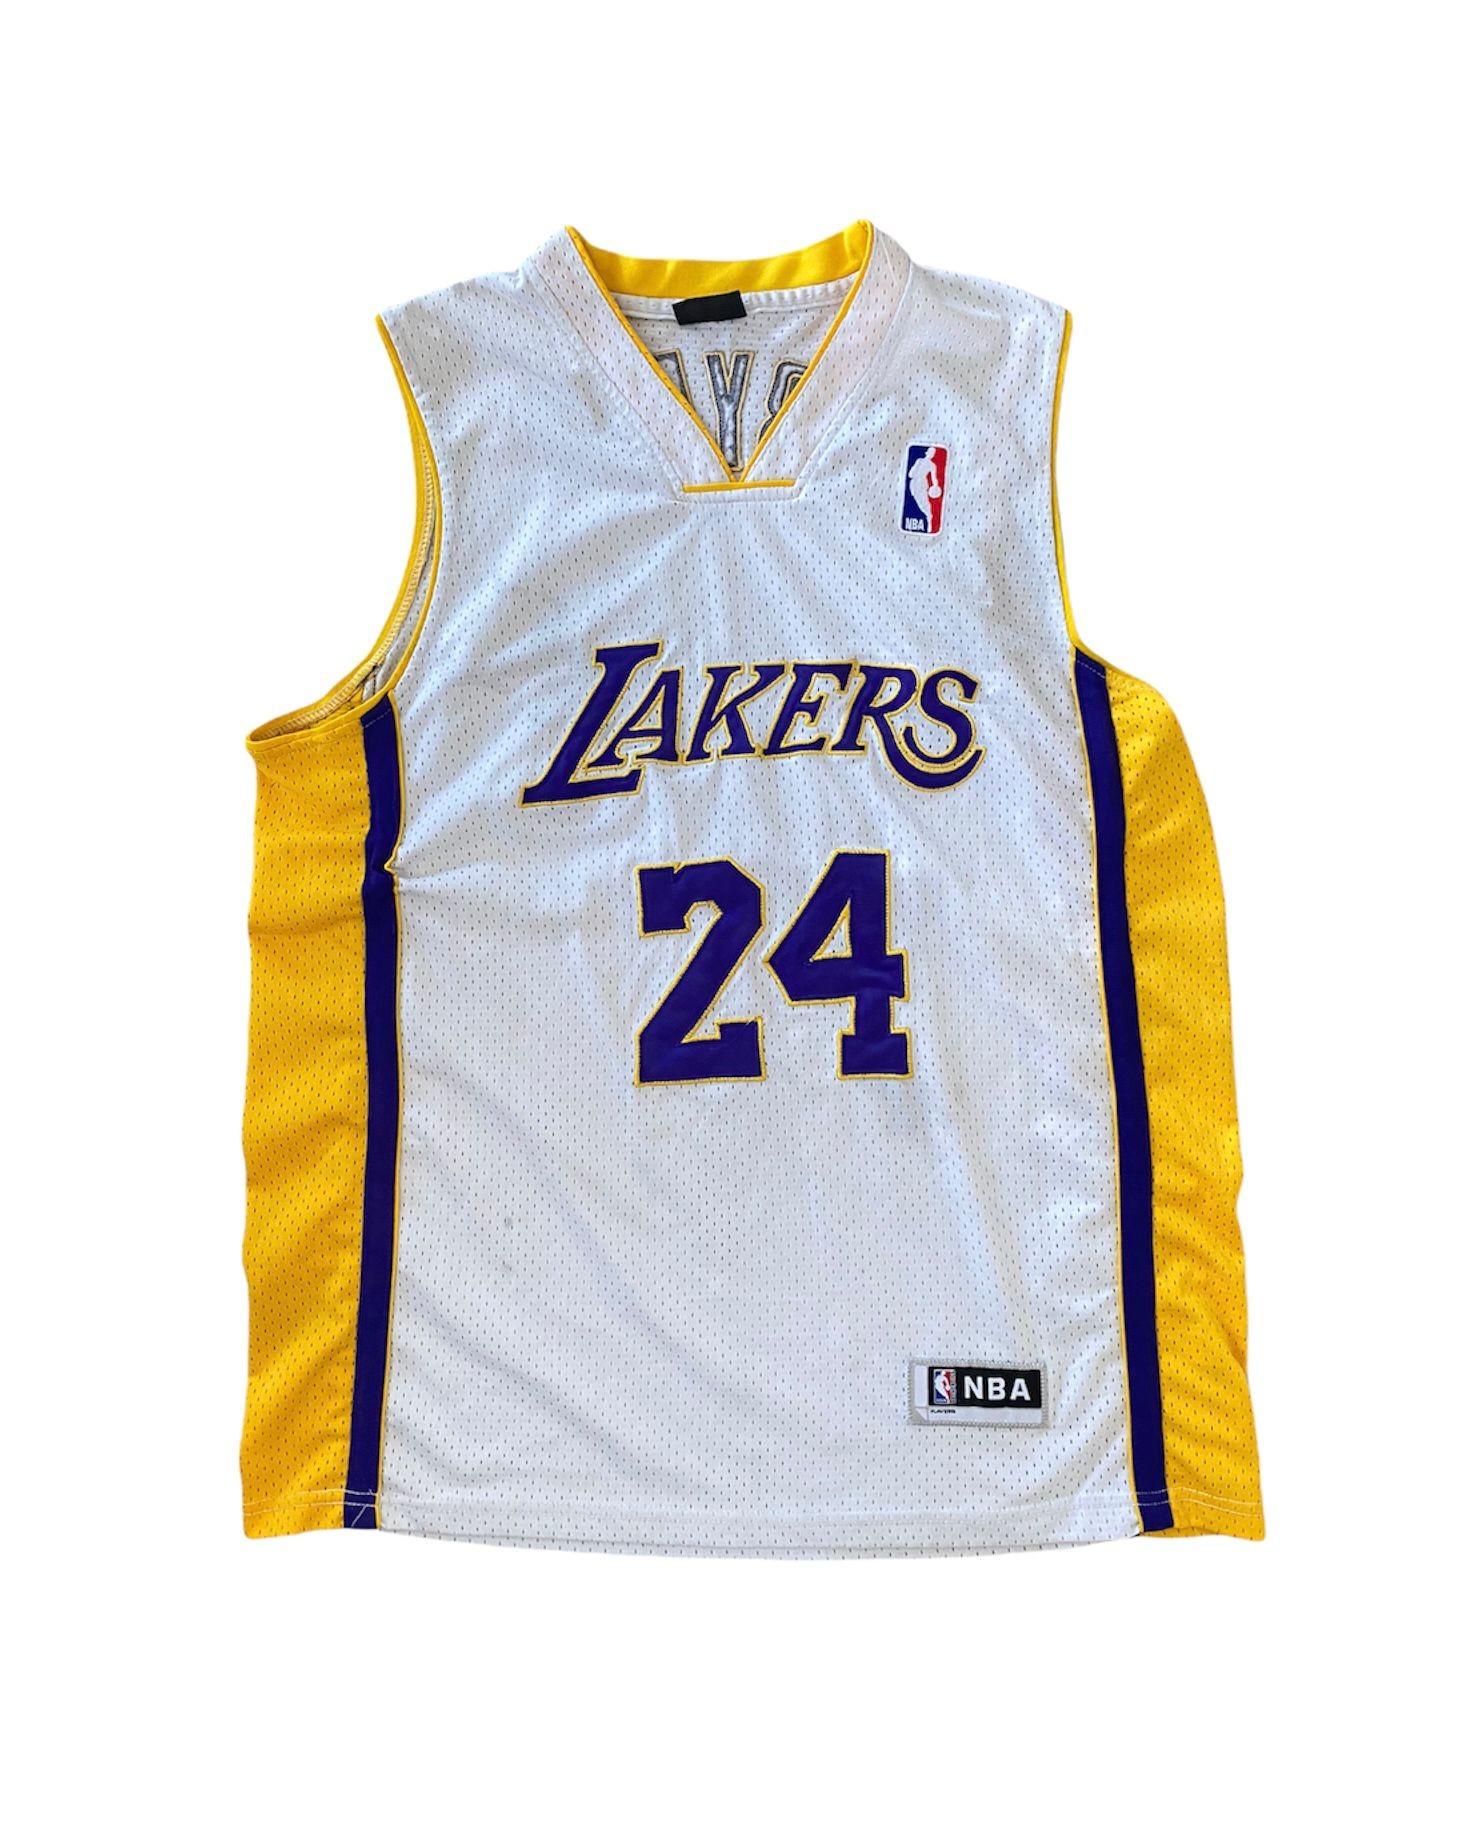 Nba Los Angeles Lakers Kobe Bryant Jersey (L)